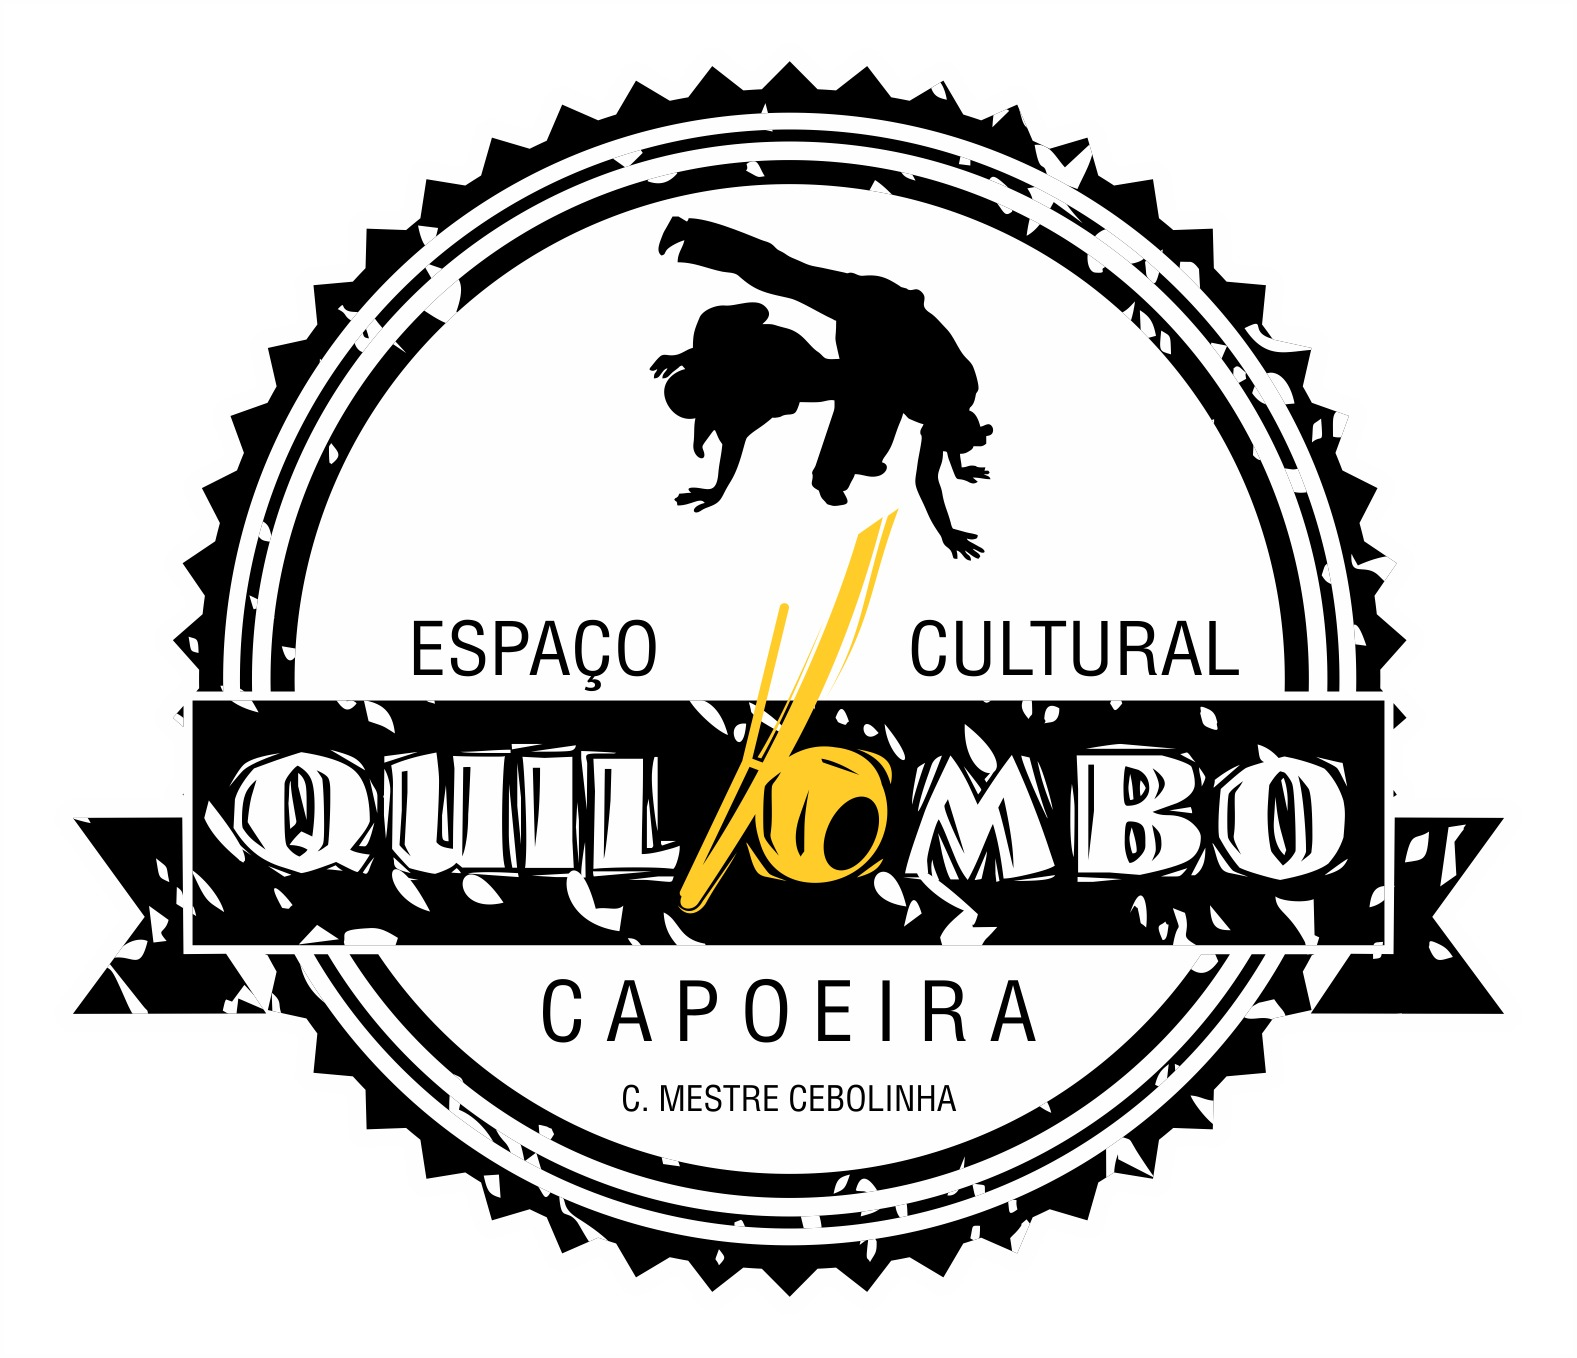 CADASTRO DOS ALUNOS DO QUILOMBO 2018